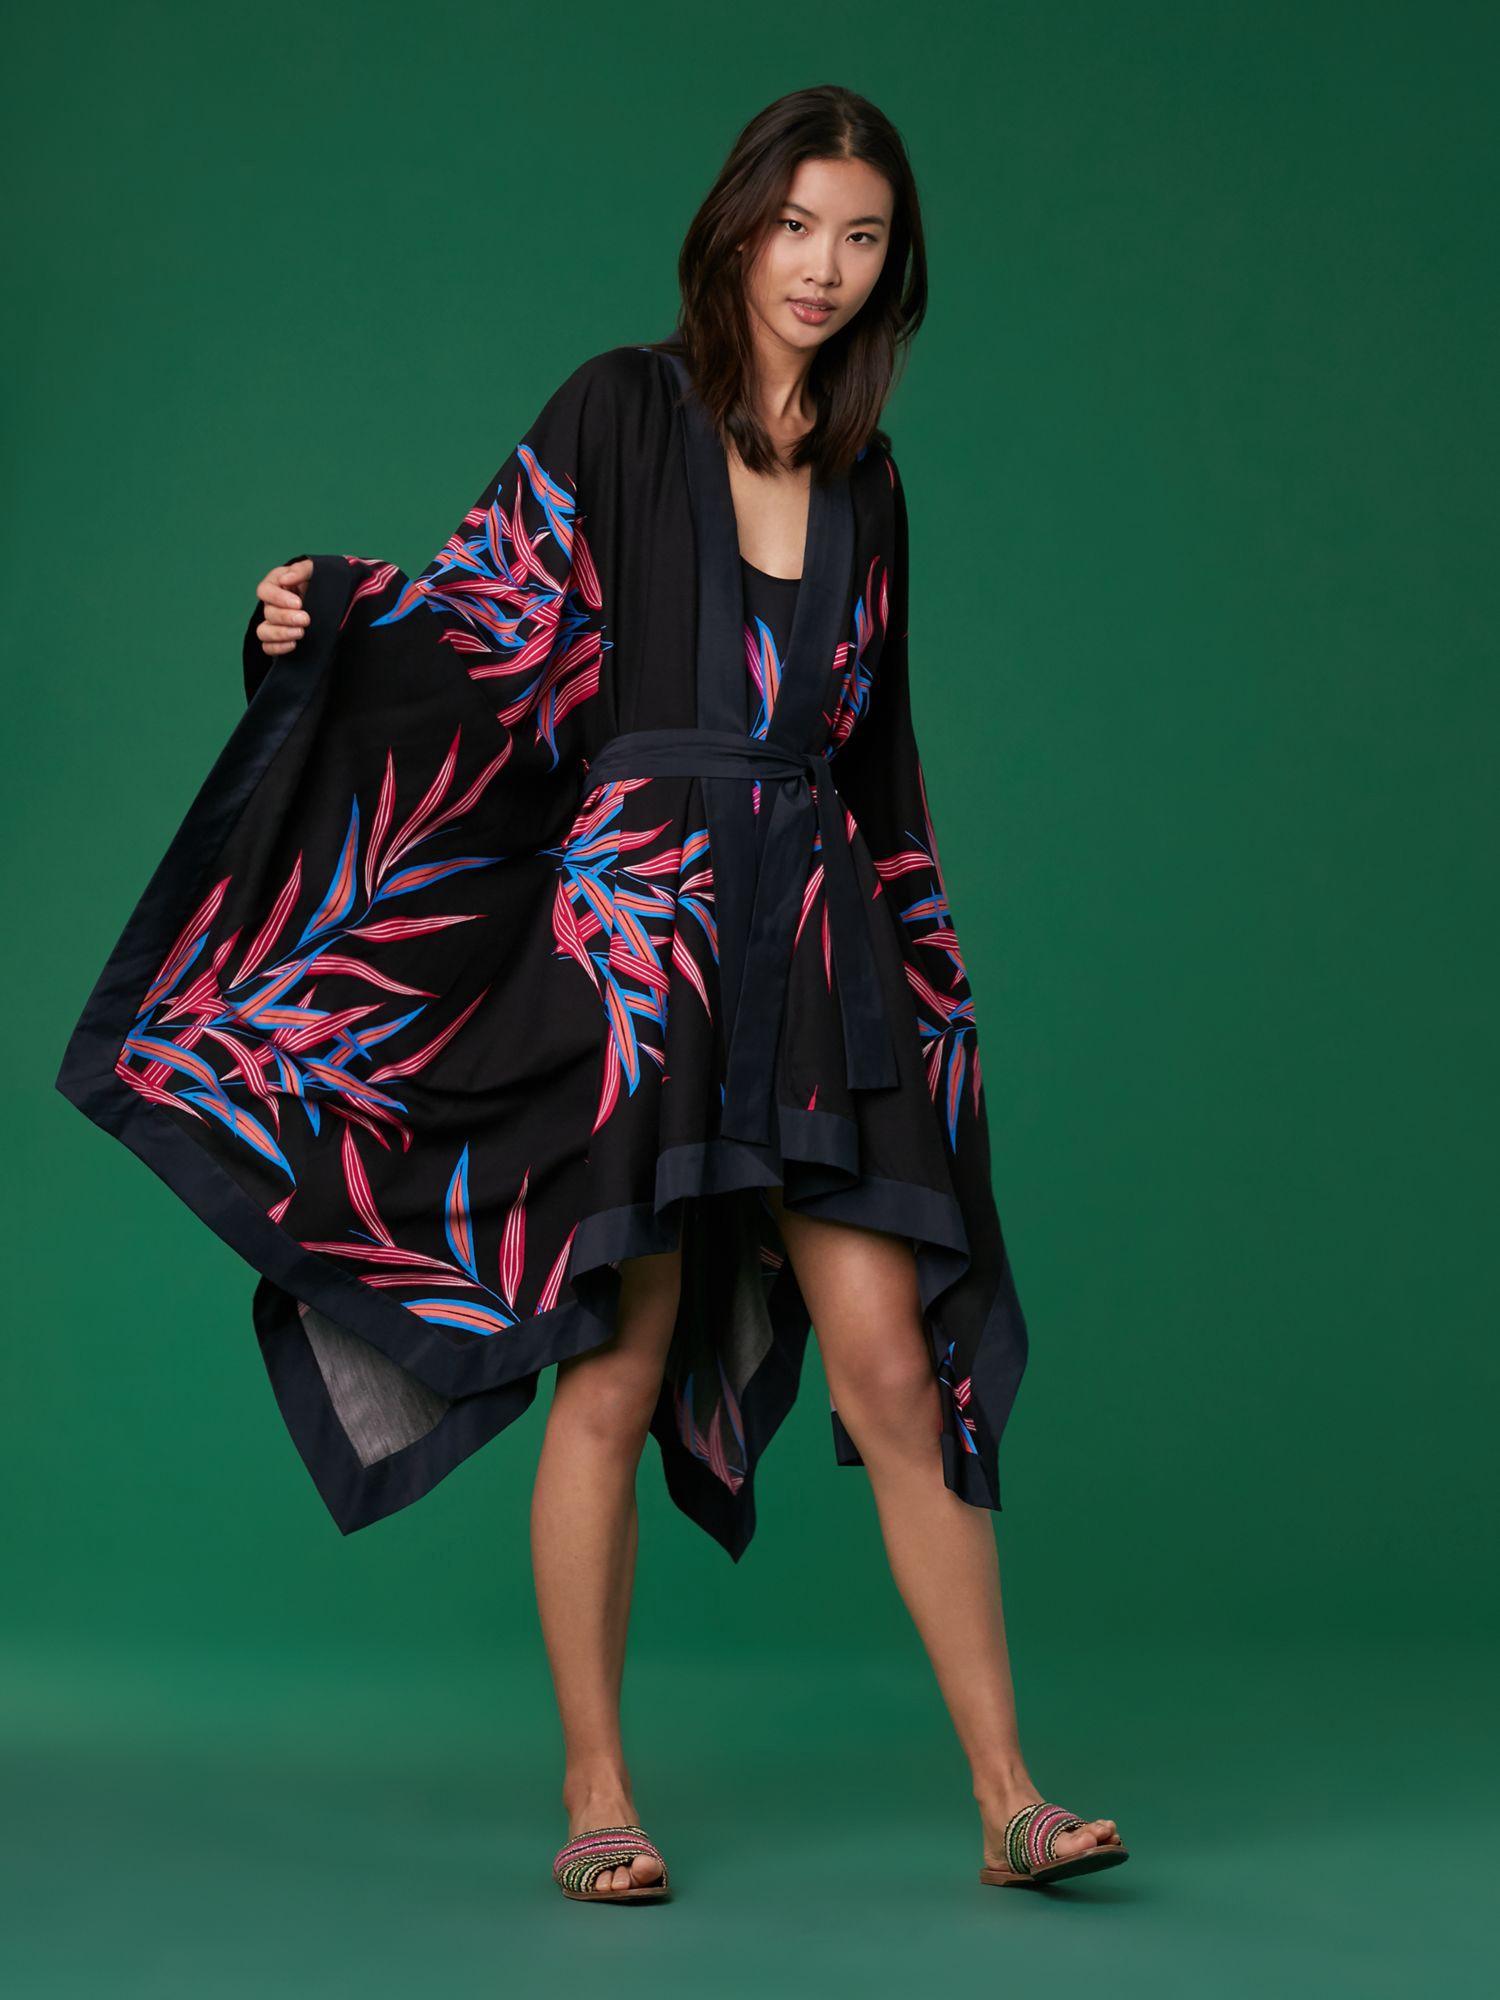 1605d1359174e Diane Von Furstenberg Dvf Beach Kimono - Bolan Black  Ultramarine Xxs